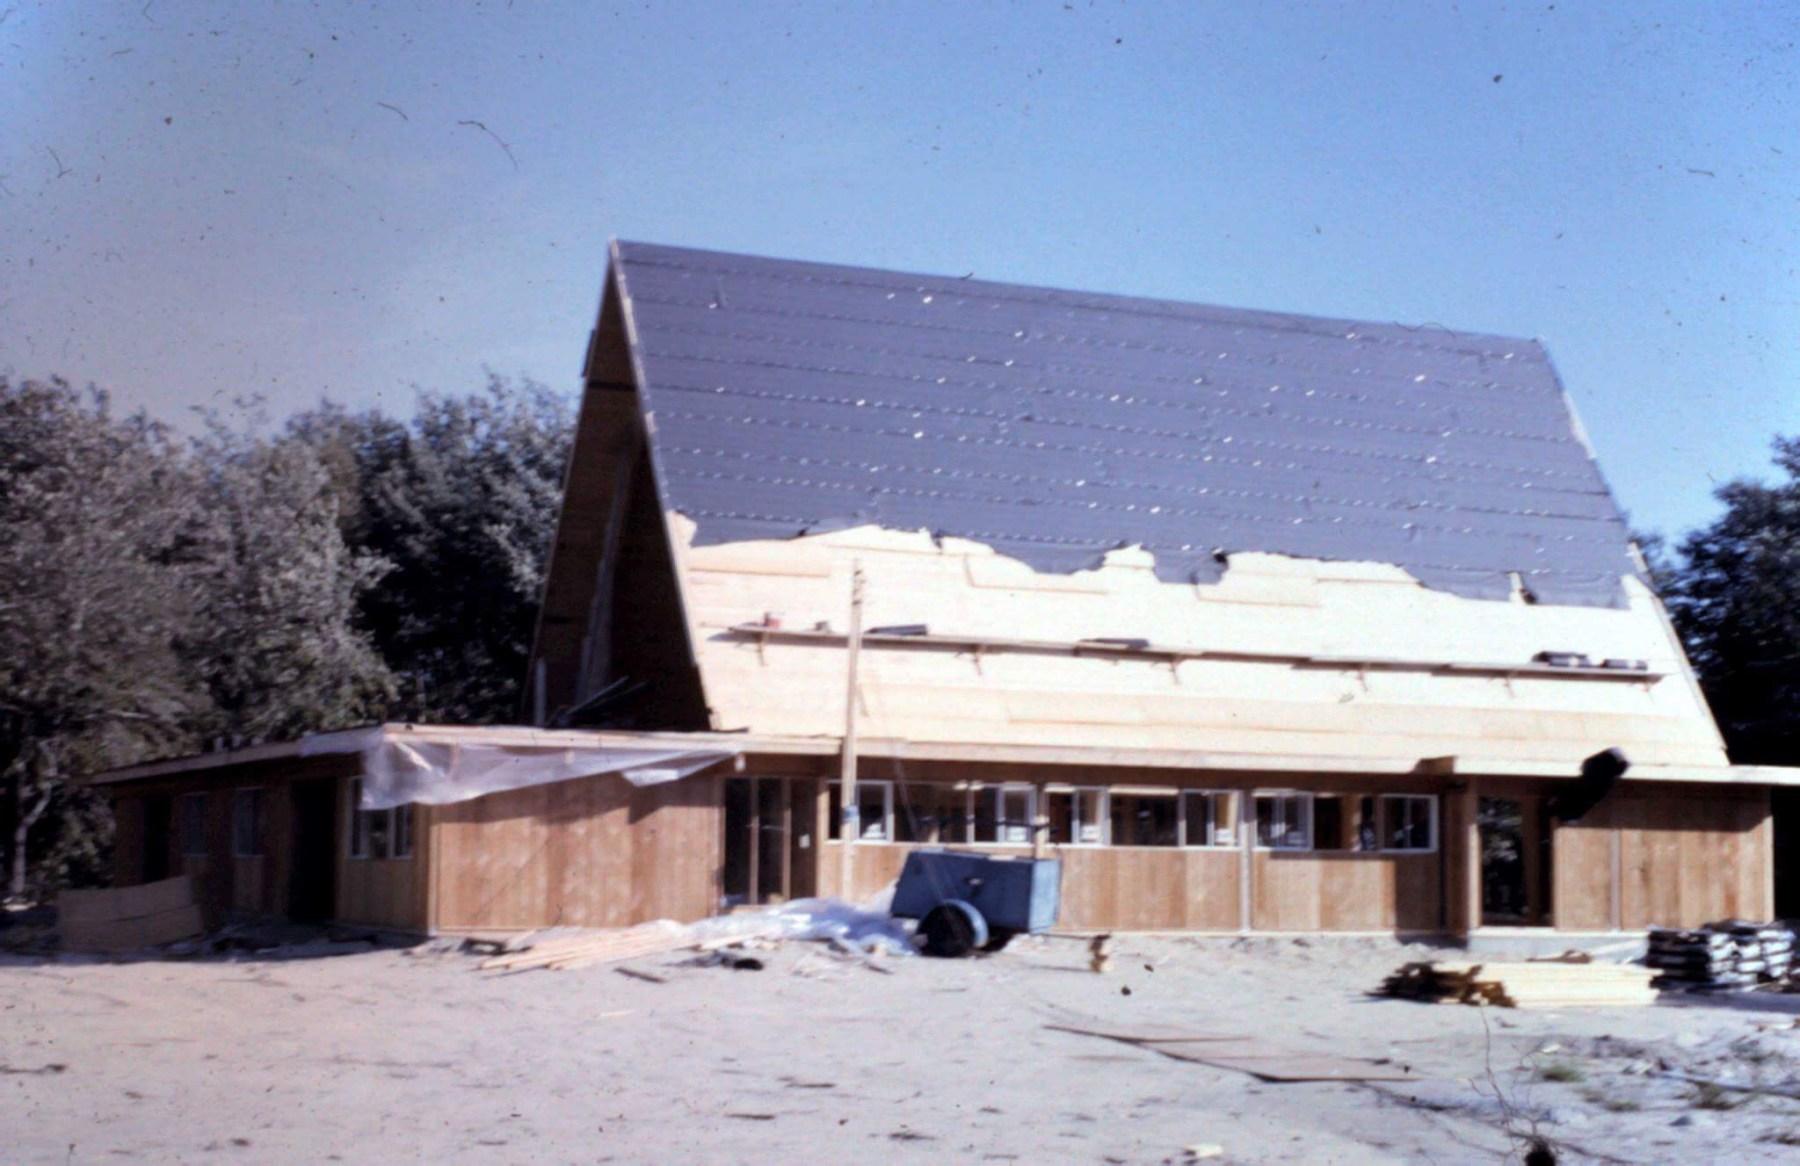 Presbyterian Church under construction, Burlington MA